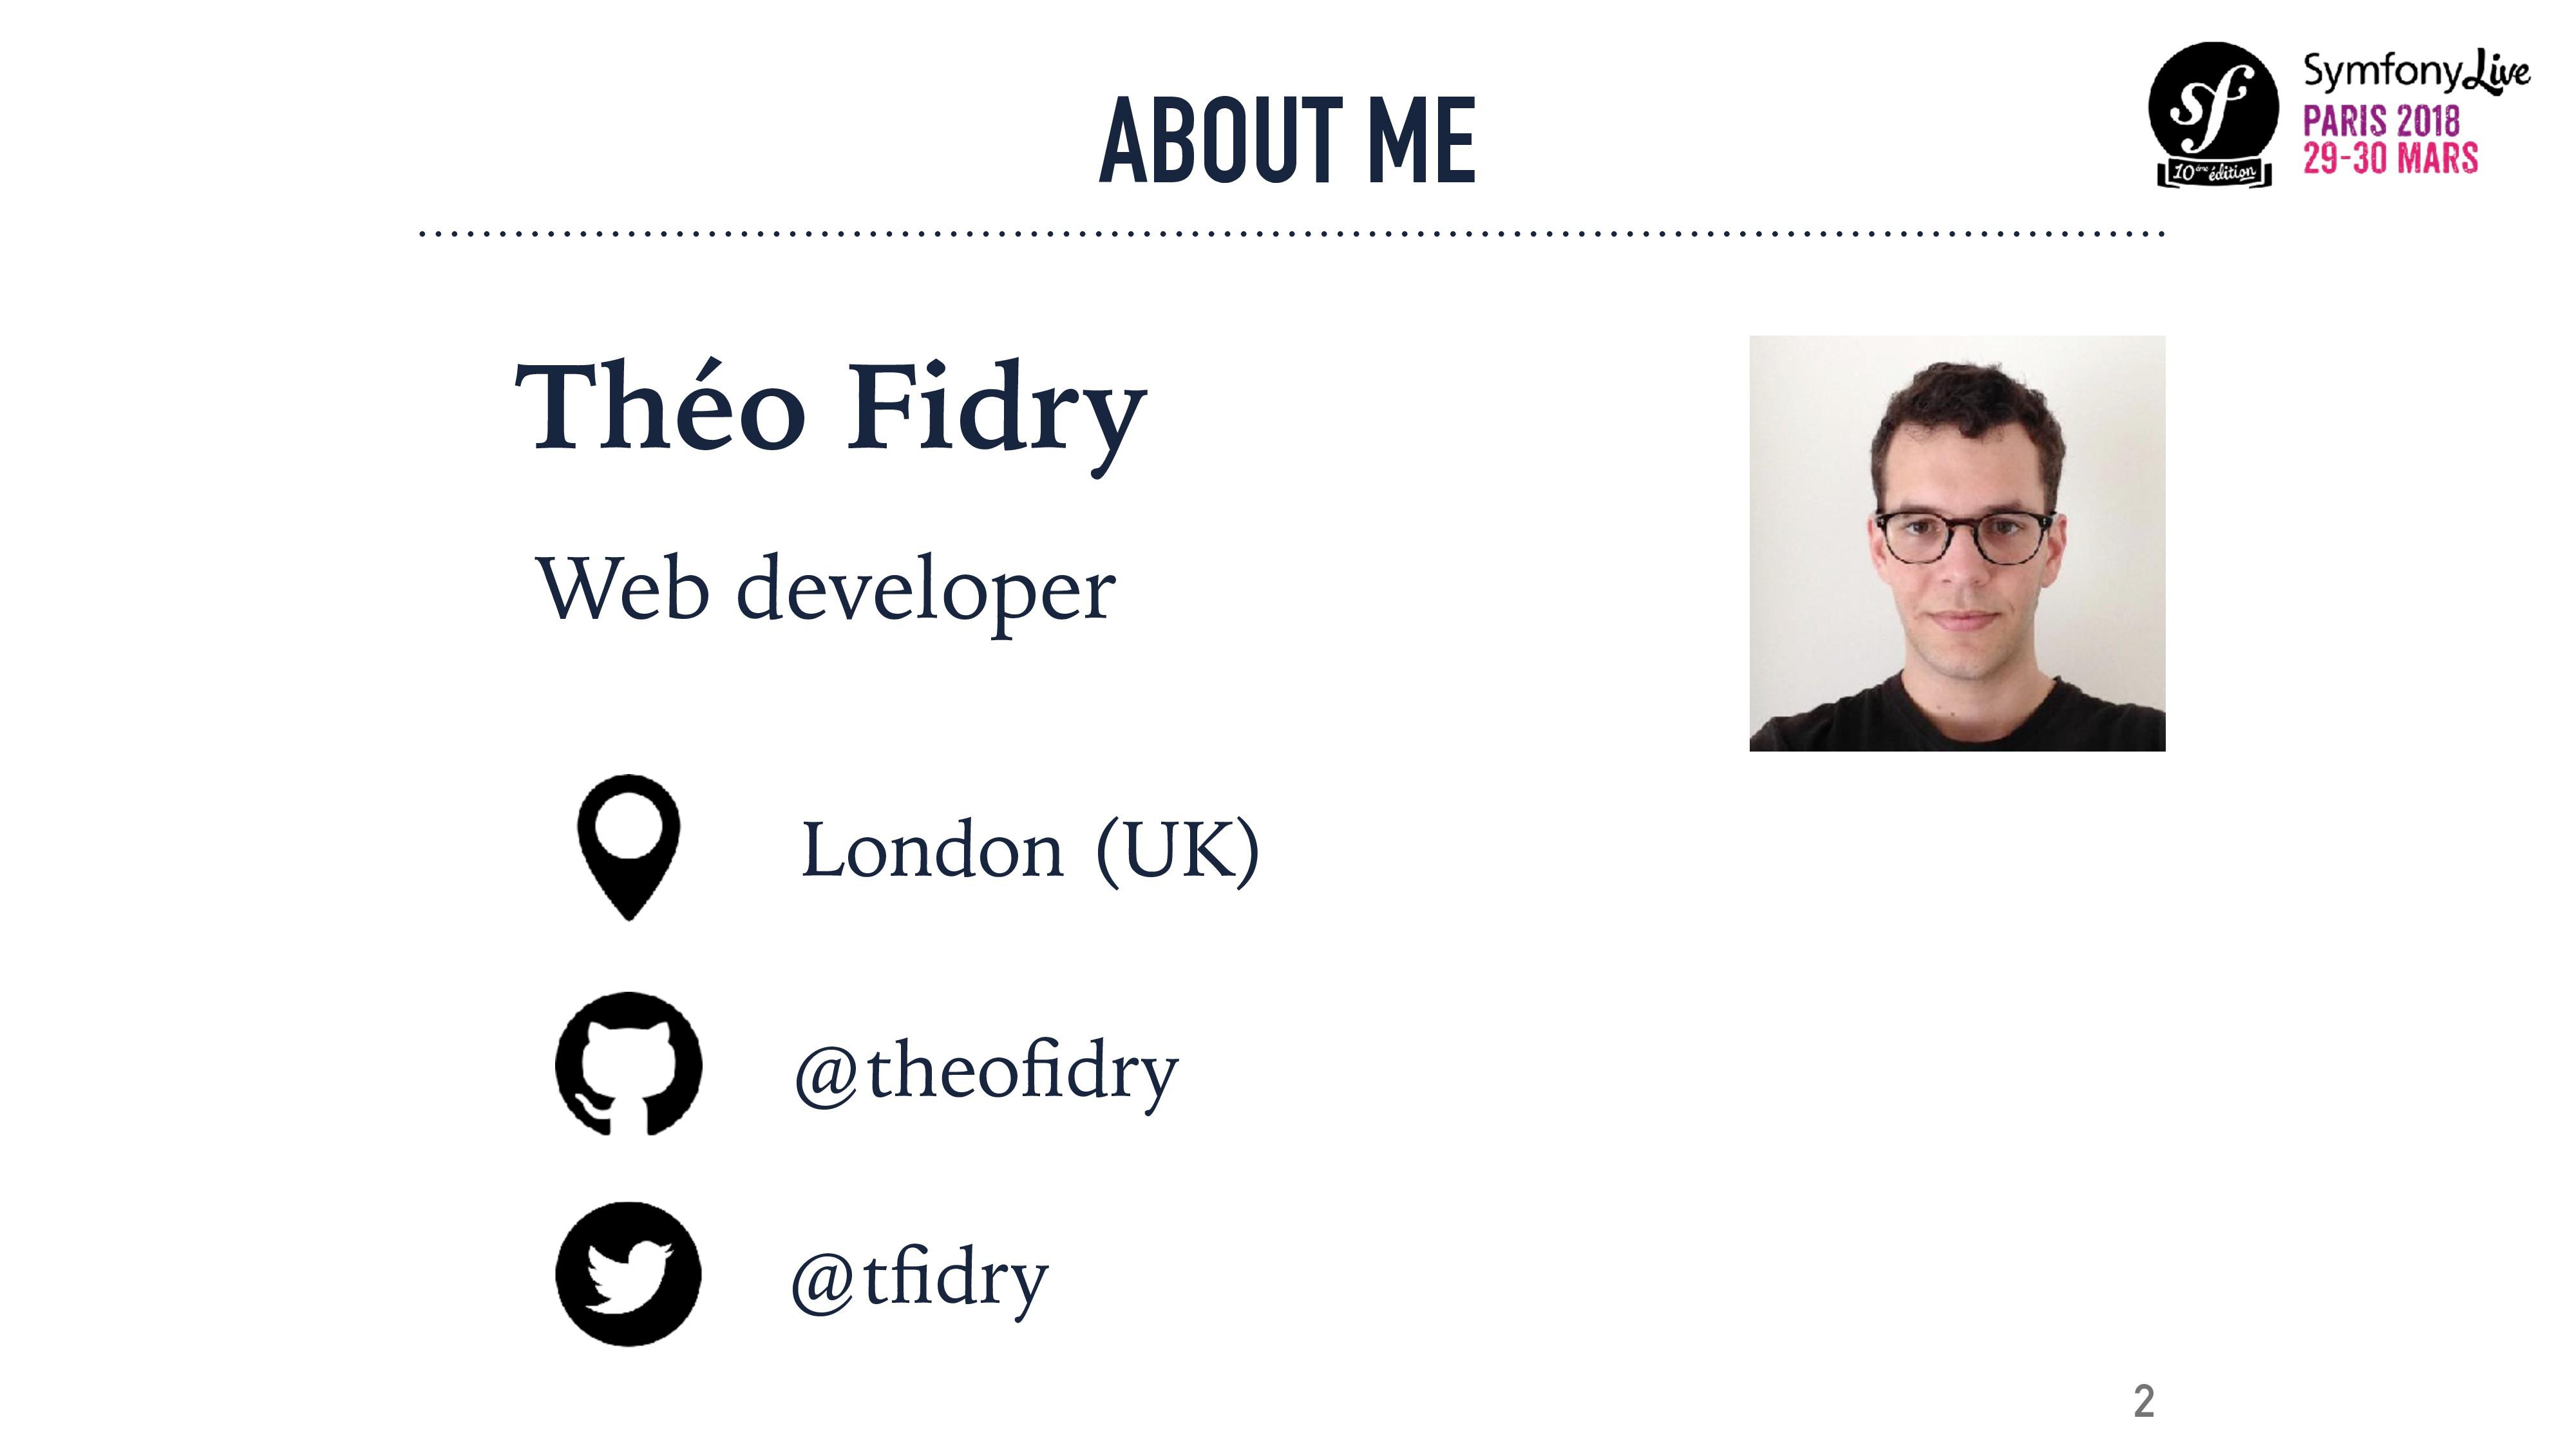 ABOUT ME 2 @tfidry @theofidry Théo Fidry Web deve...